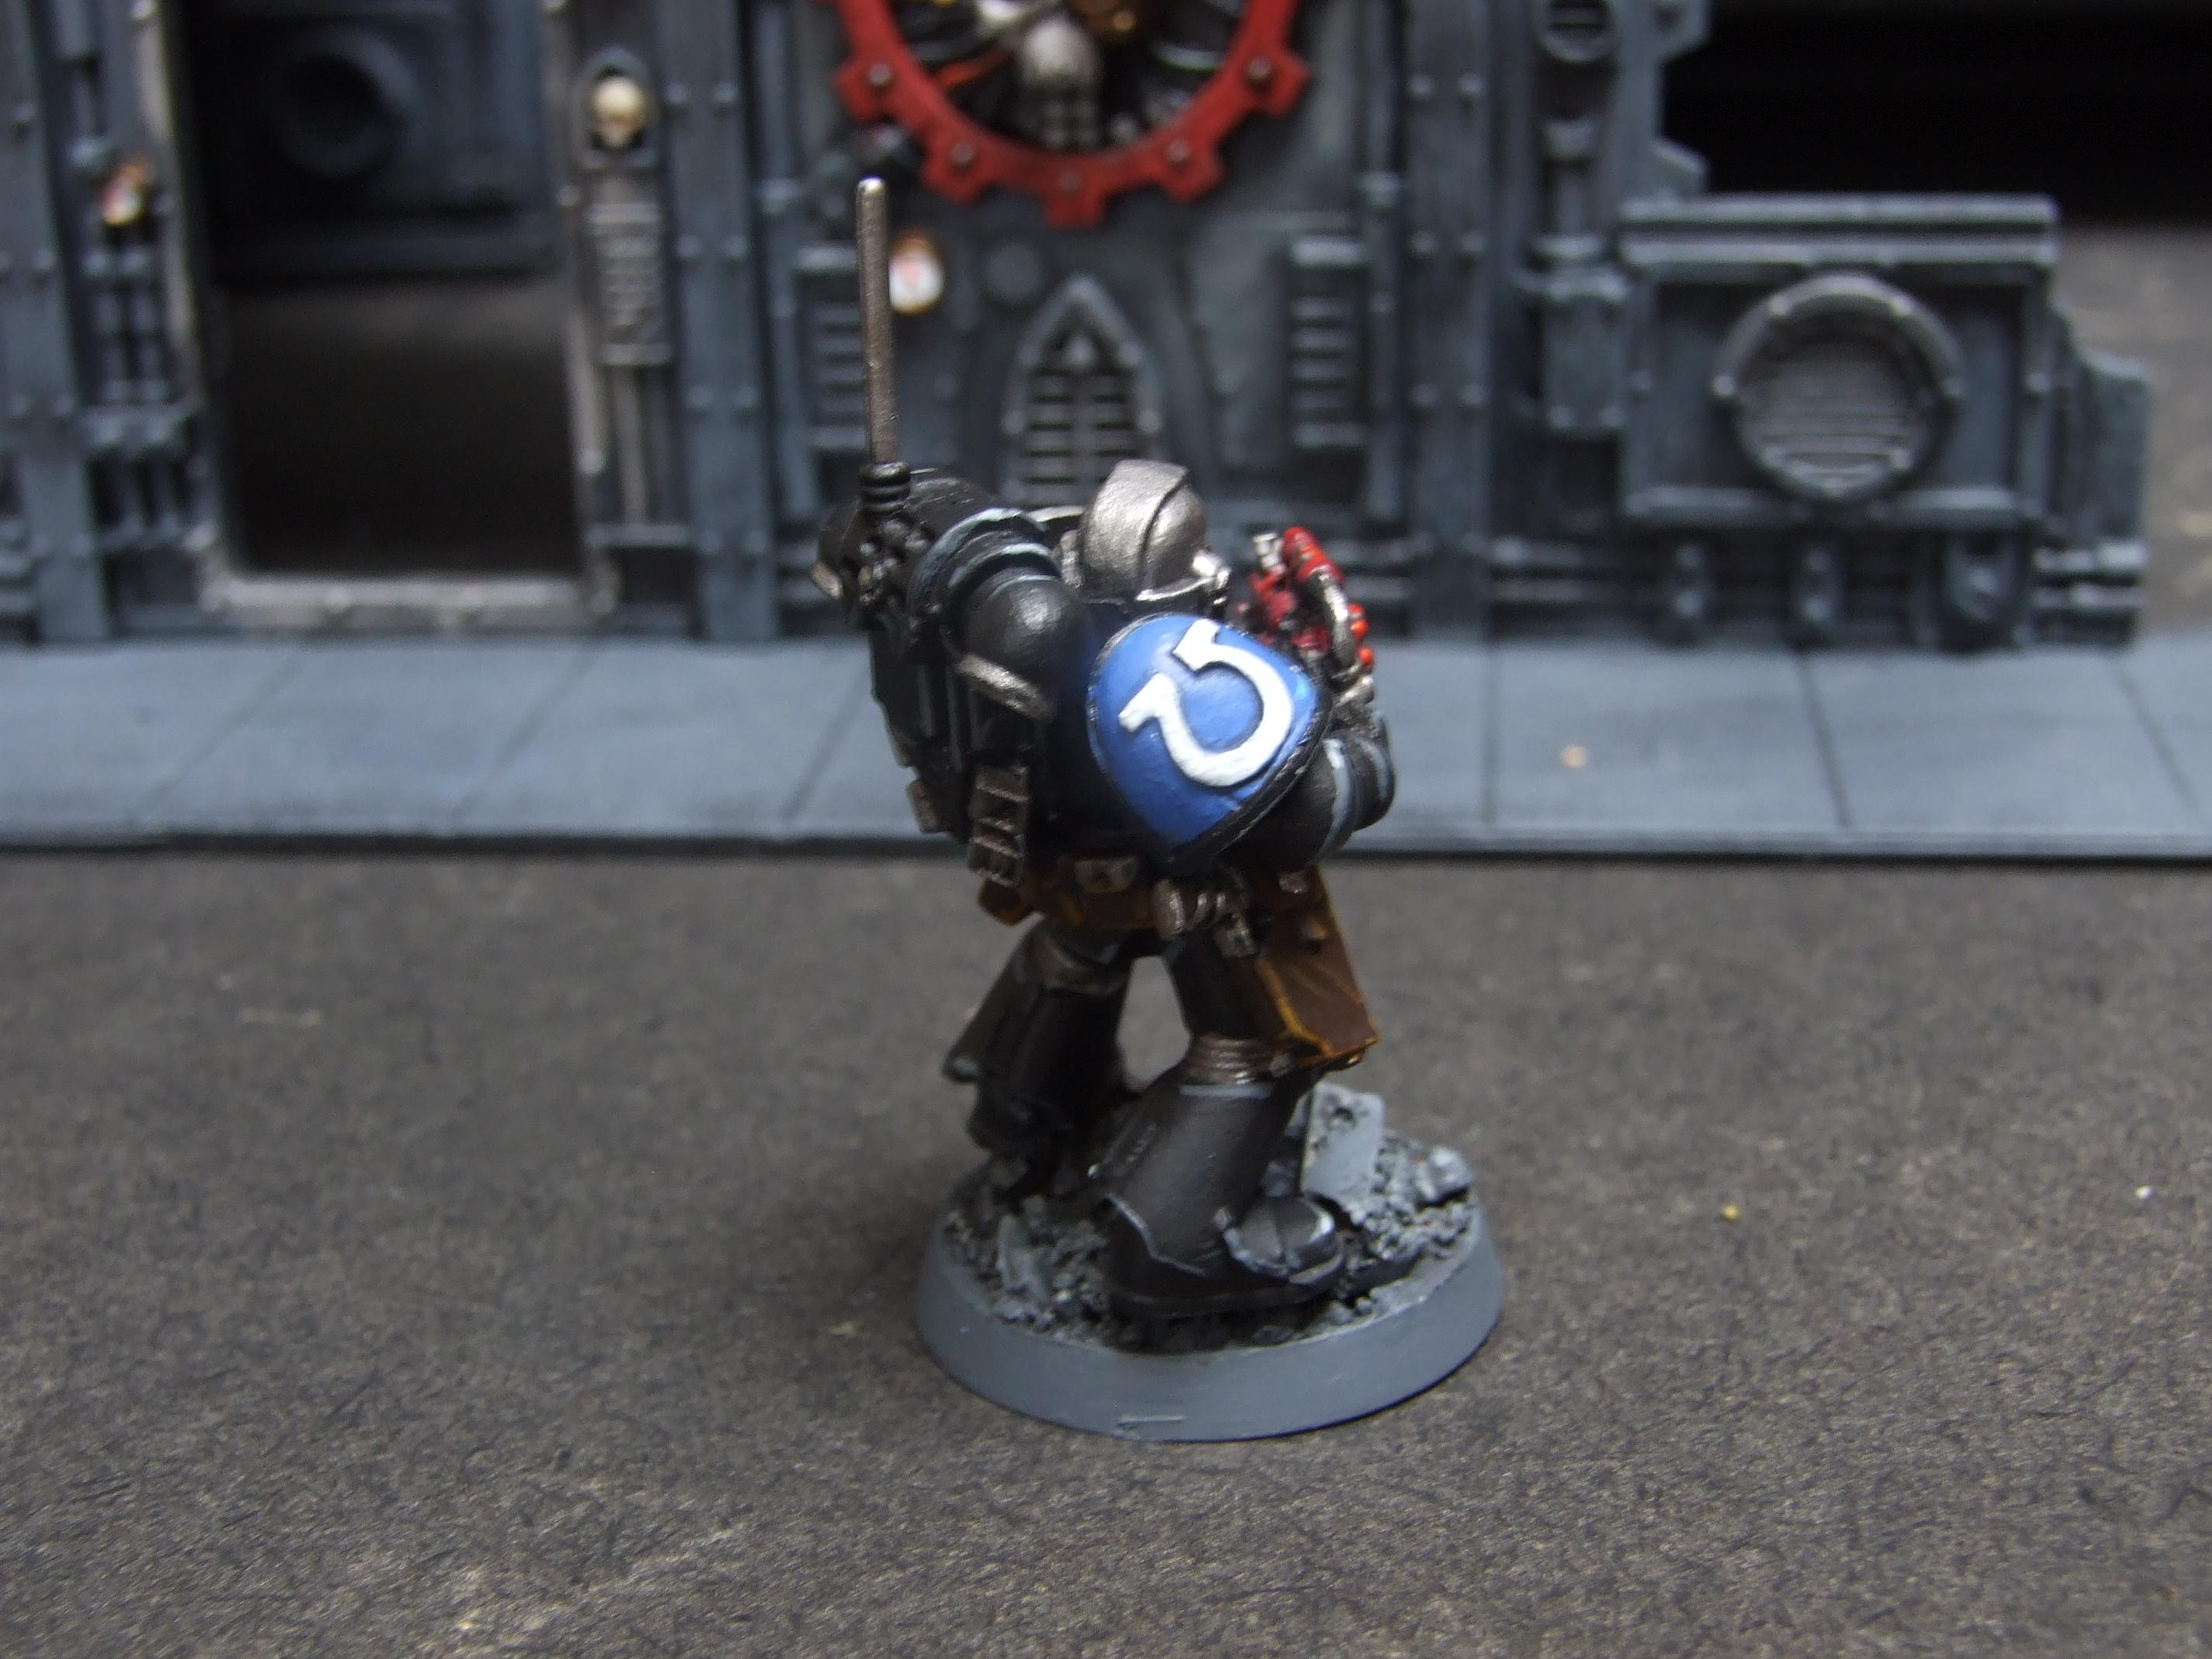 Deathwatch, Imperial, Kill Team, Ordus Xeno, Space Marines, Veteran Sergeant, Warhammer 40,000